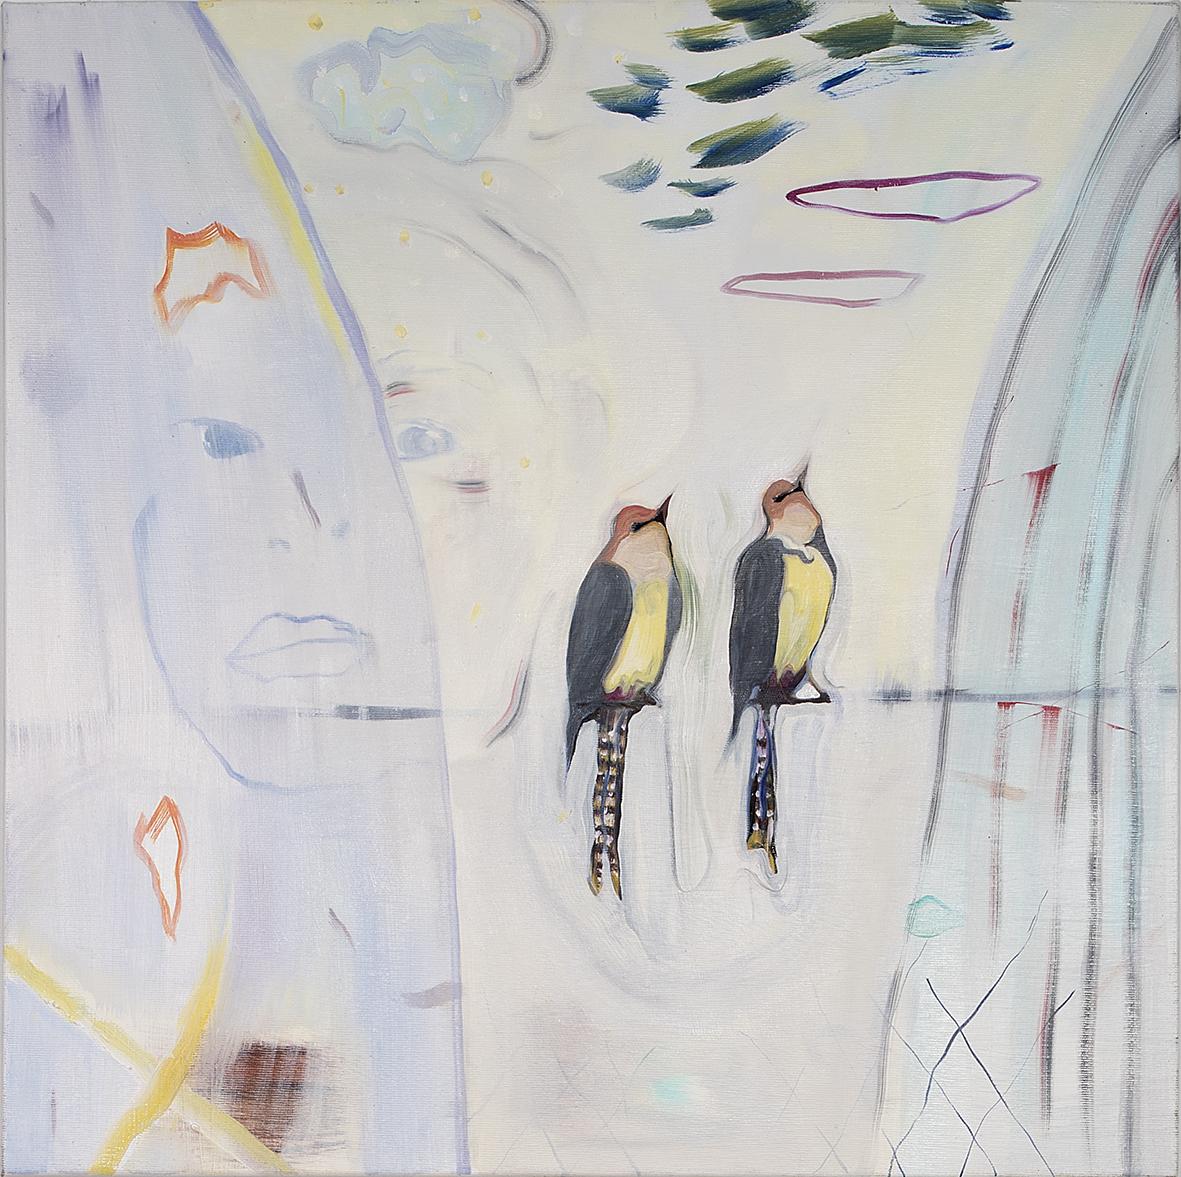 Vera Portatadino, Hypnosis, 2015, olio su tela, 60 x 60 cm